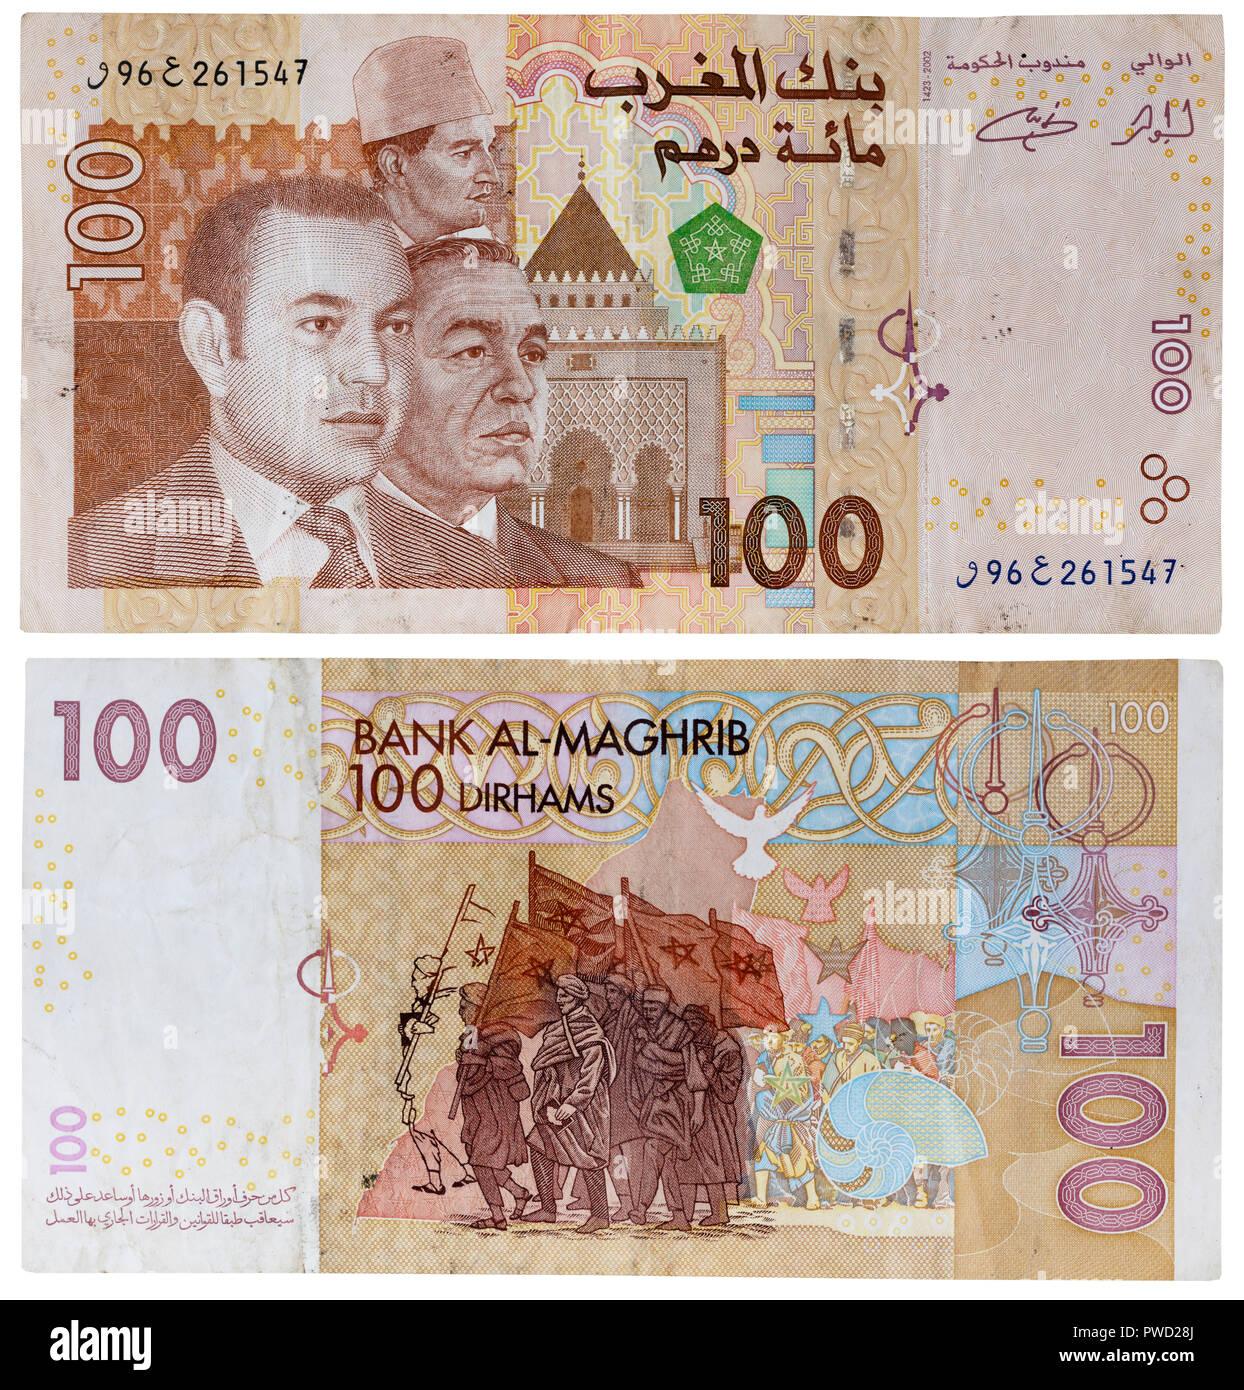 100 dirhams banknote, Kings Hassan II, Mohammed VI, Morocco, 2002 - Stock Image